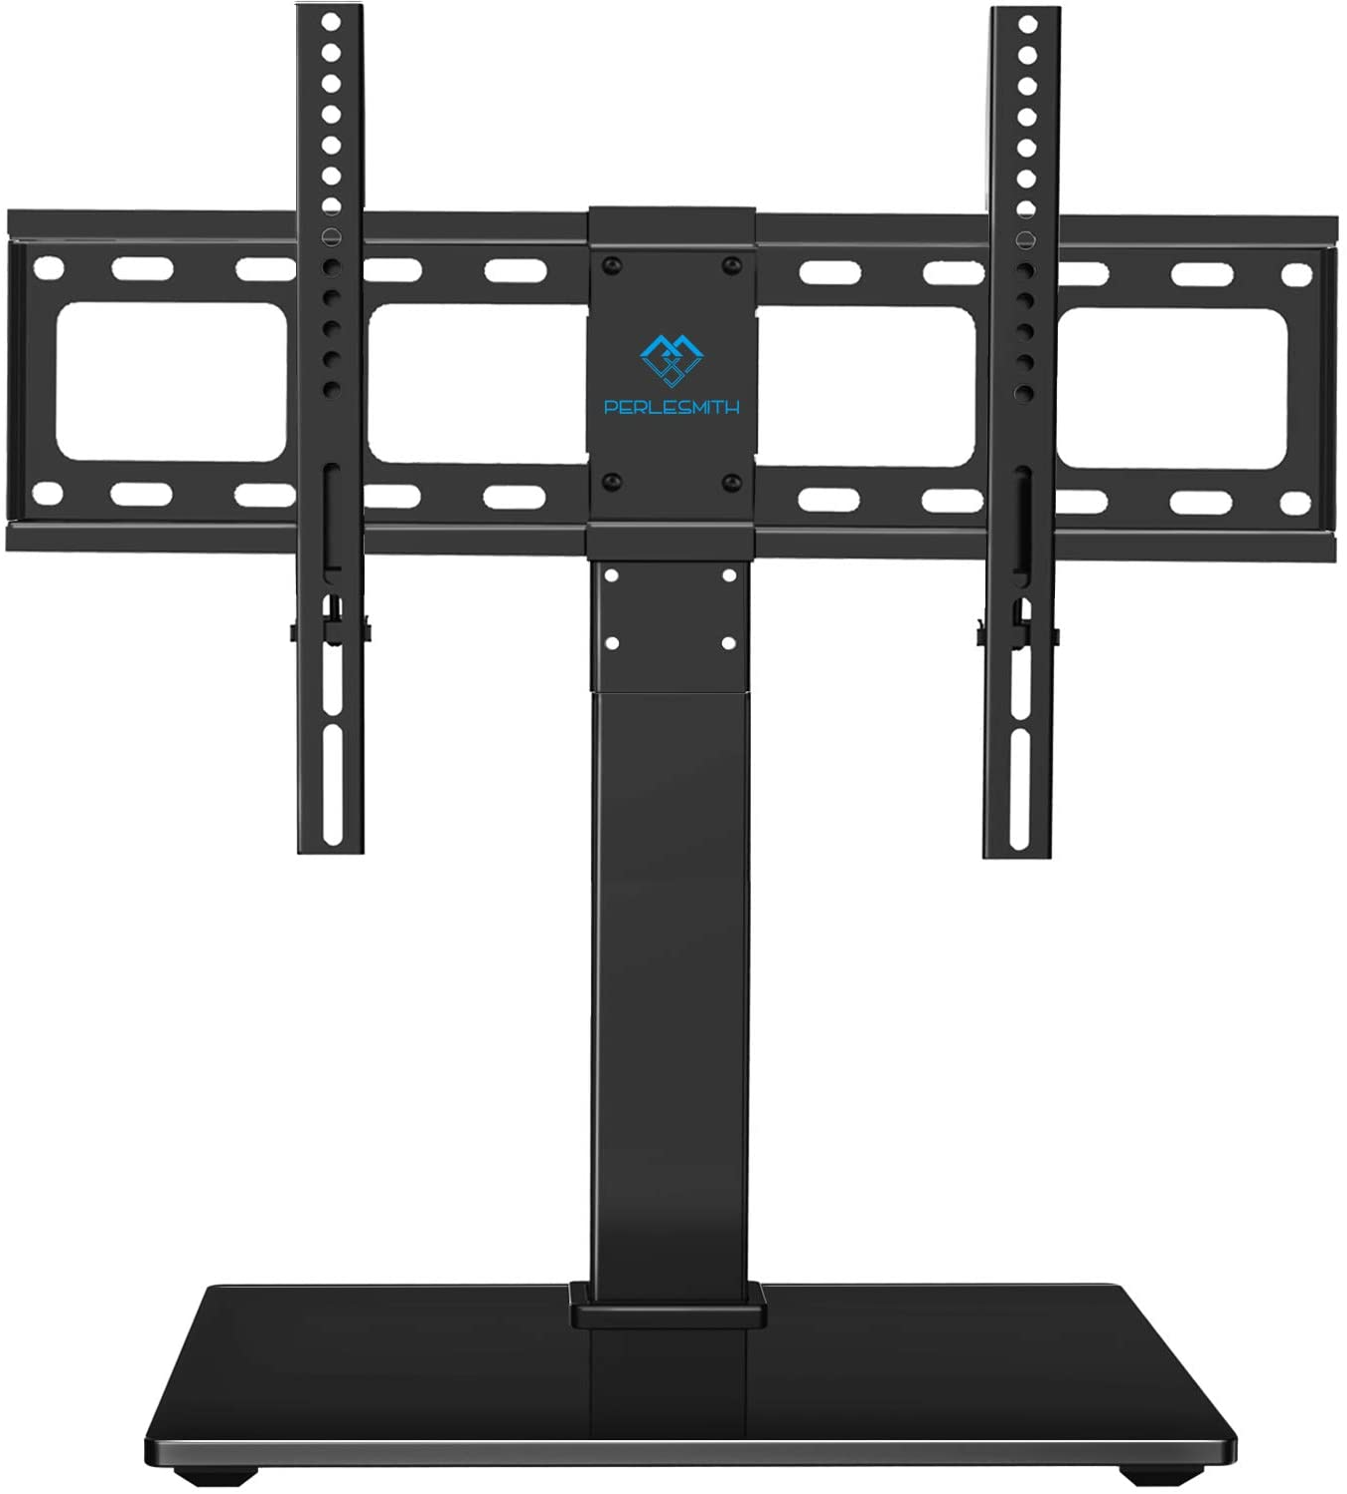 PERLESMITH 37-65 inch 88lbs Universal Swivel TV Stand $36.11